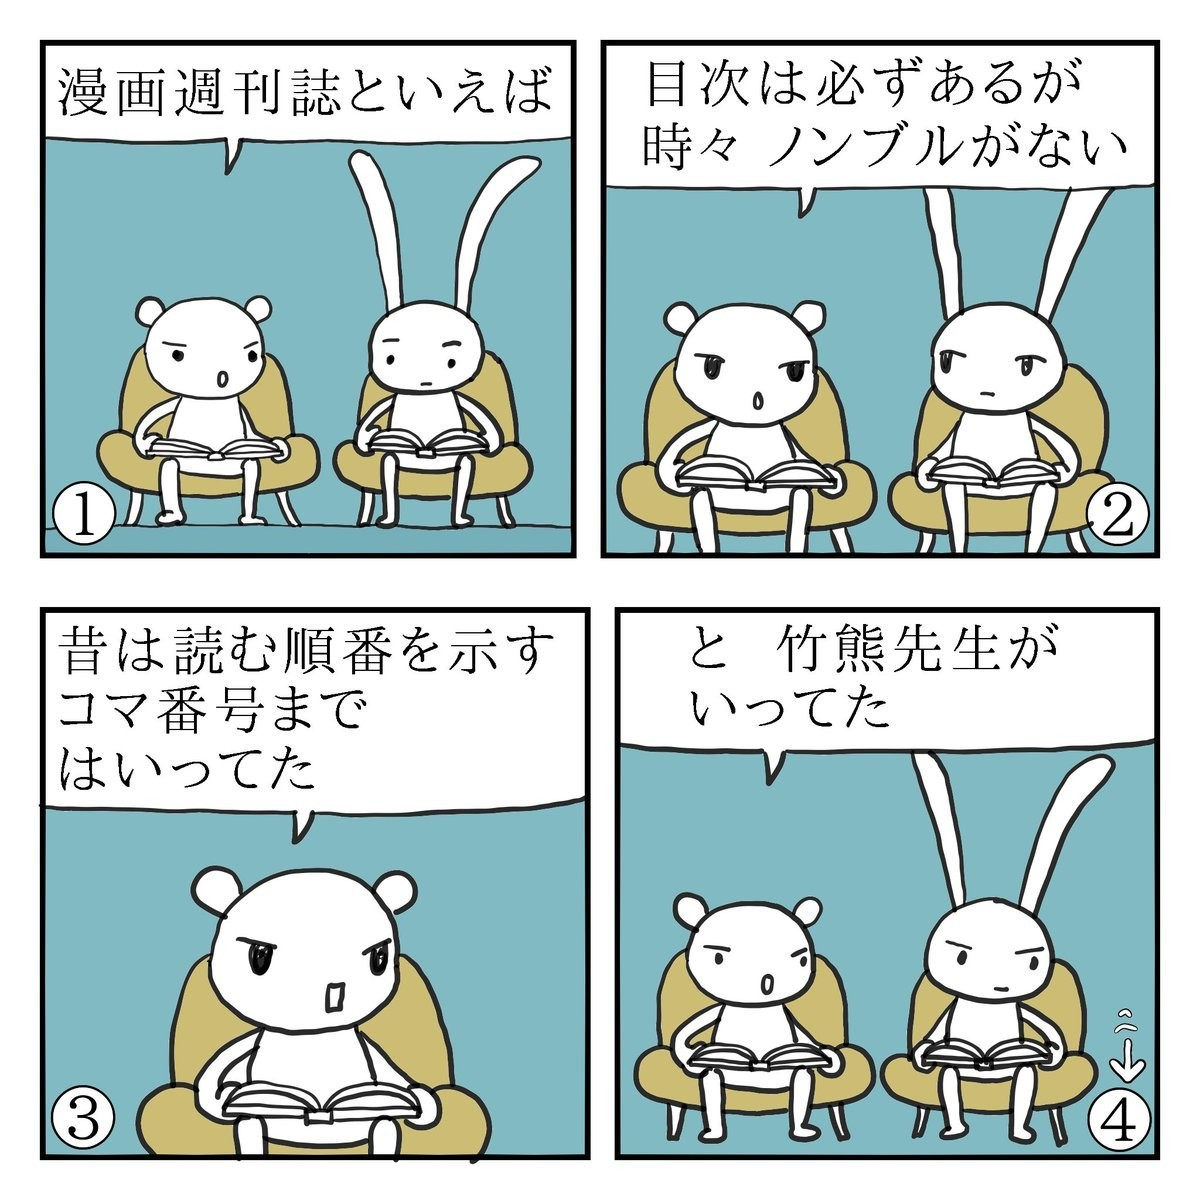 f:id:kanarihikokuma:20190317101005j:image:w330